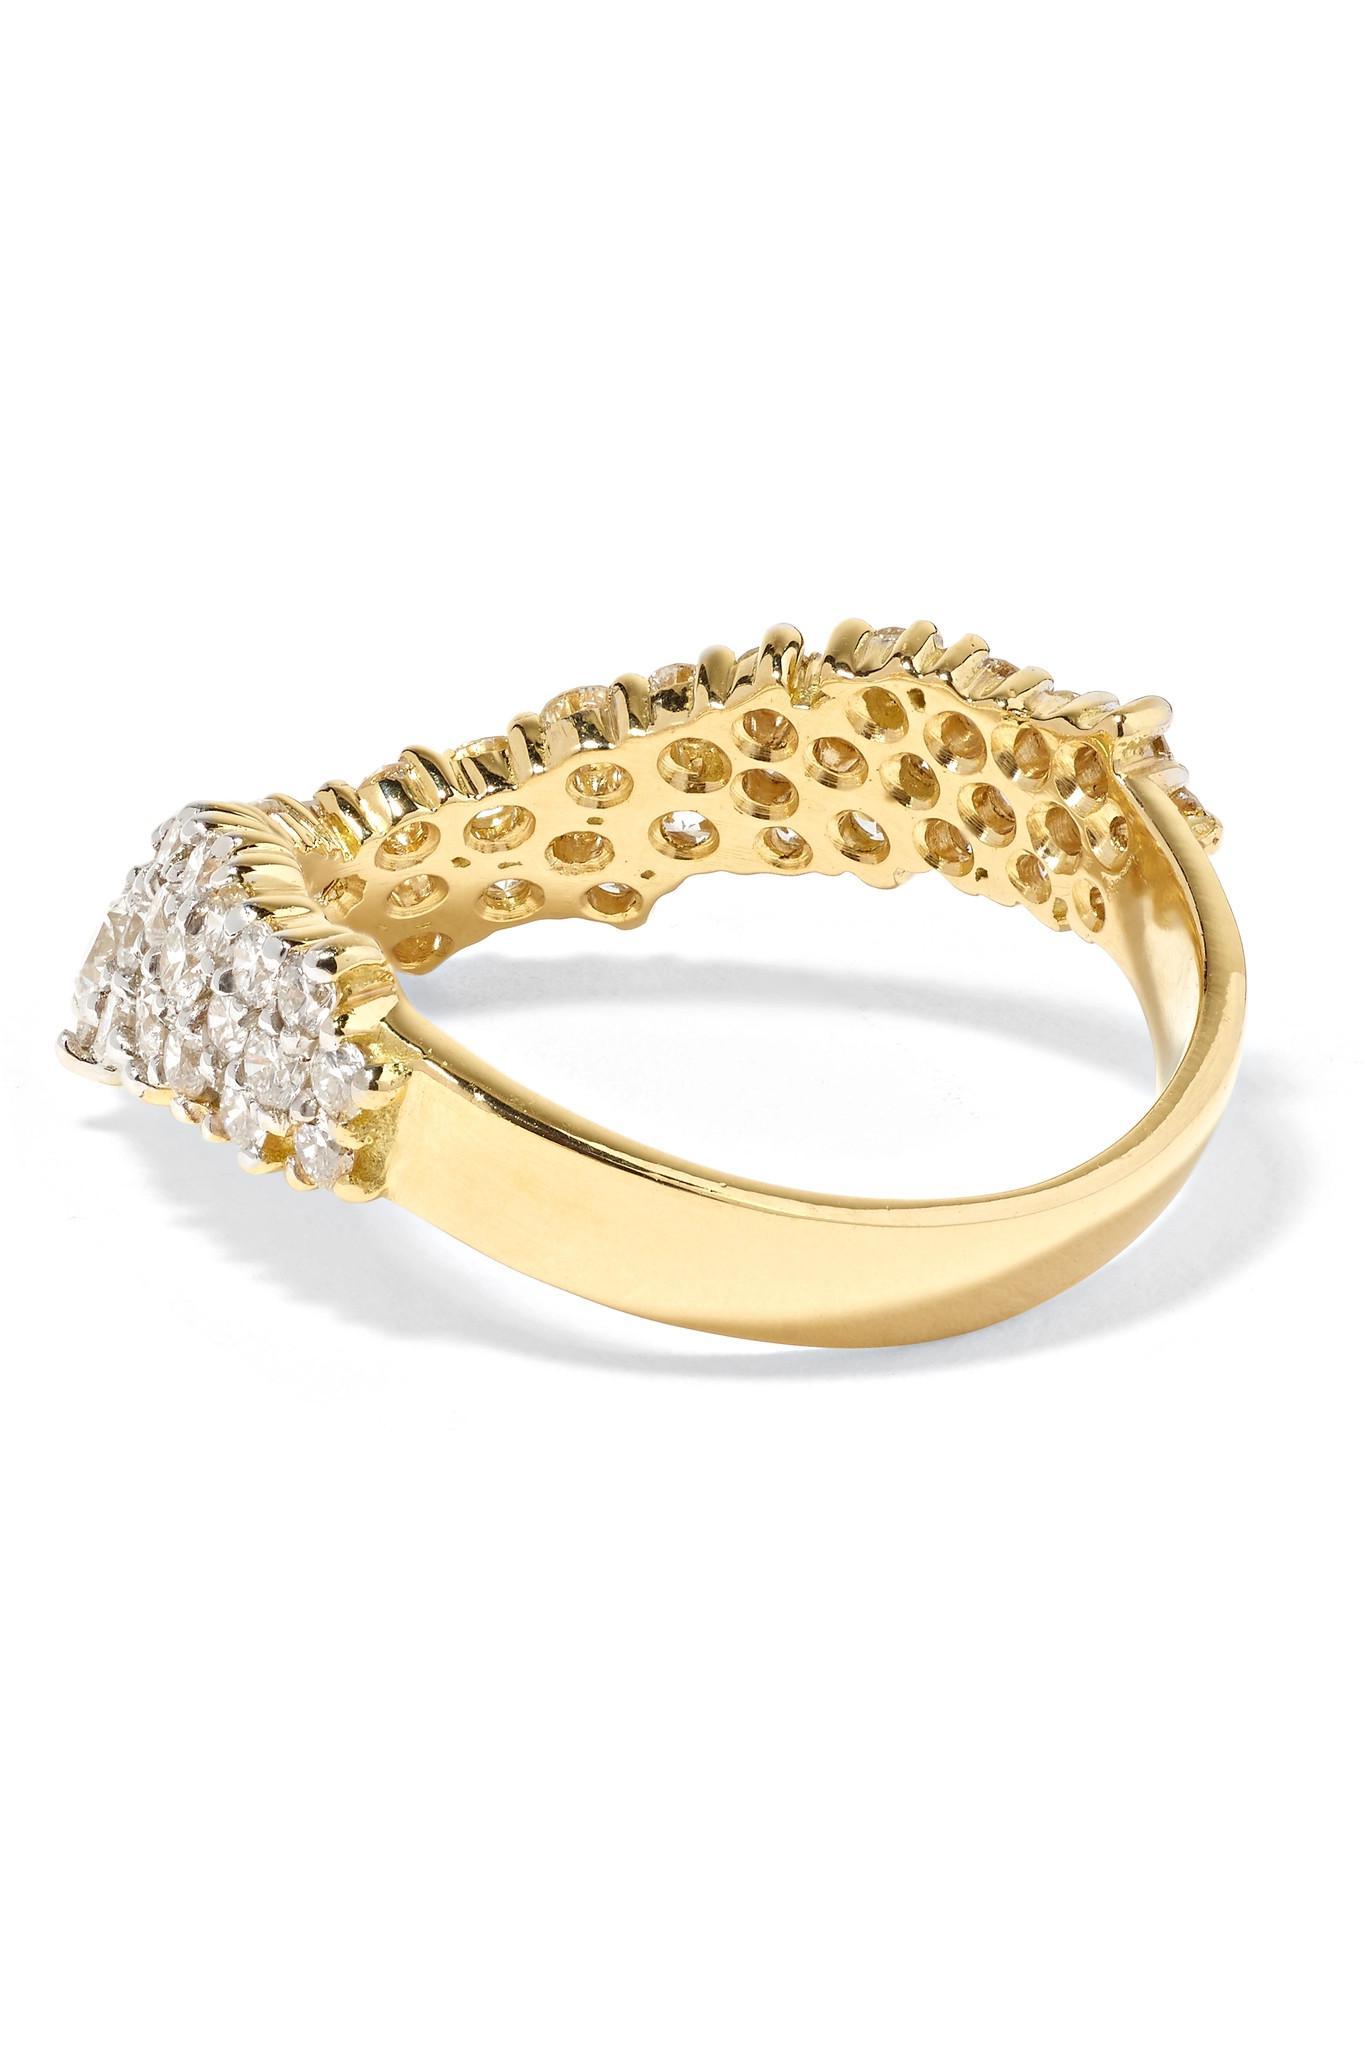 Simplicity 18-karat Gold Diamond Ring - 6 Ana Khouri FmLIy8